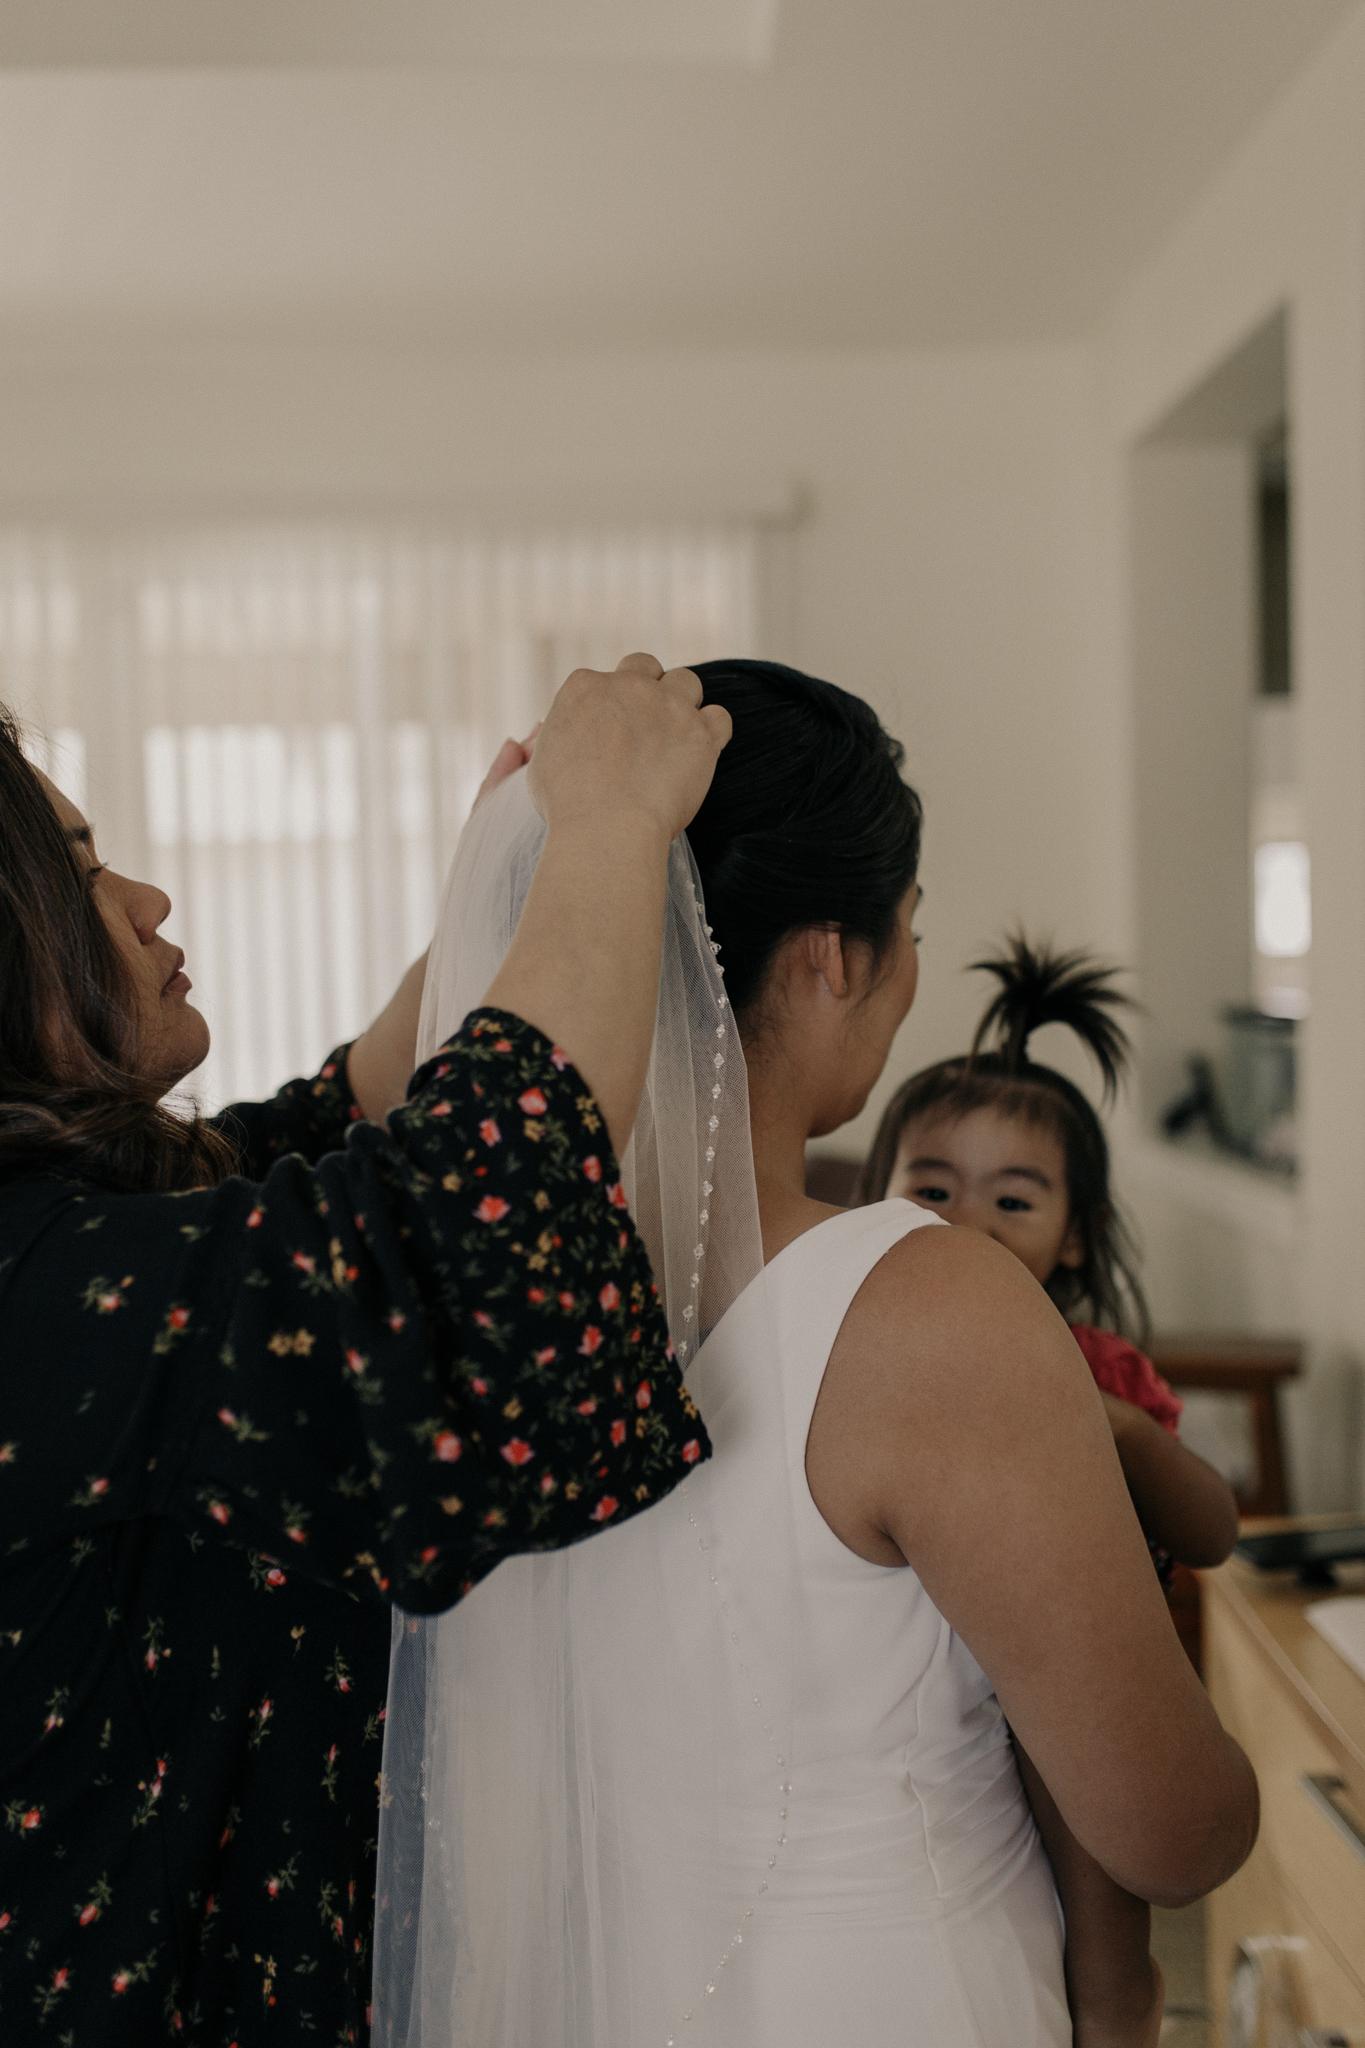 putting on wedding veil photo